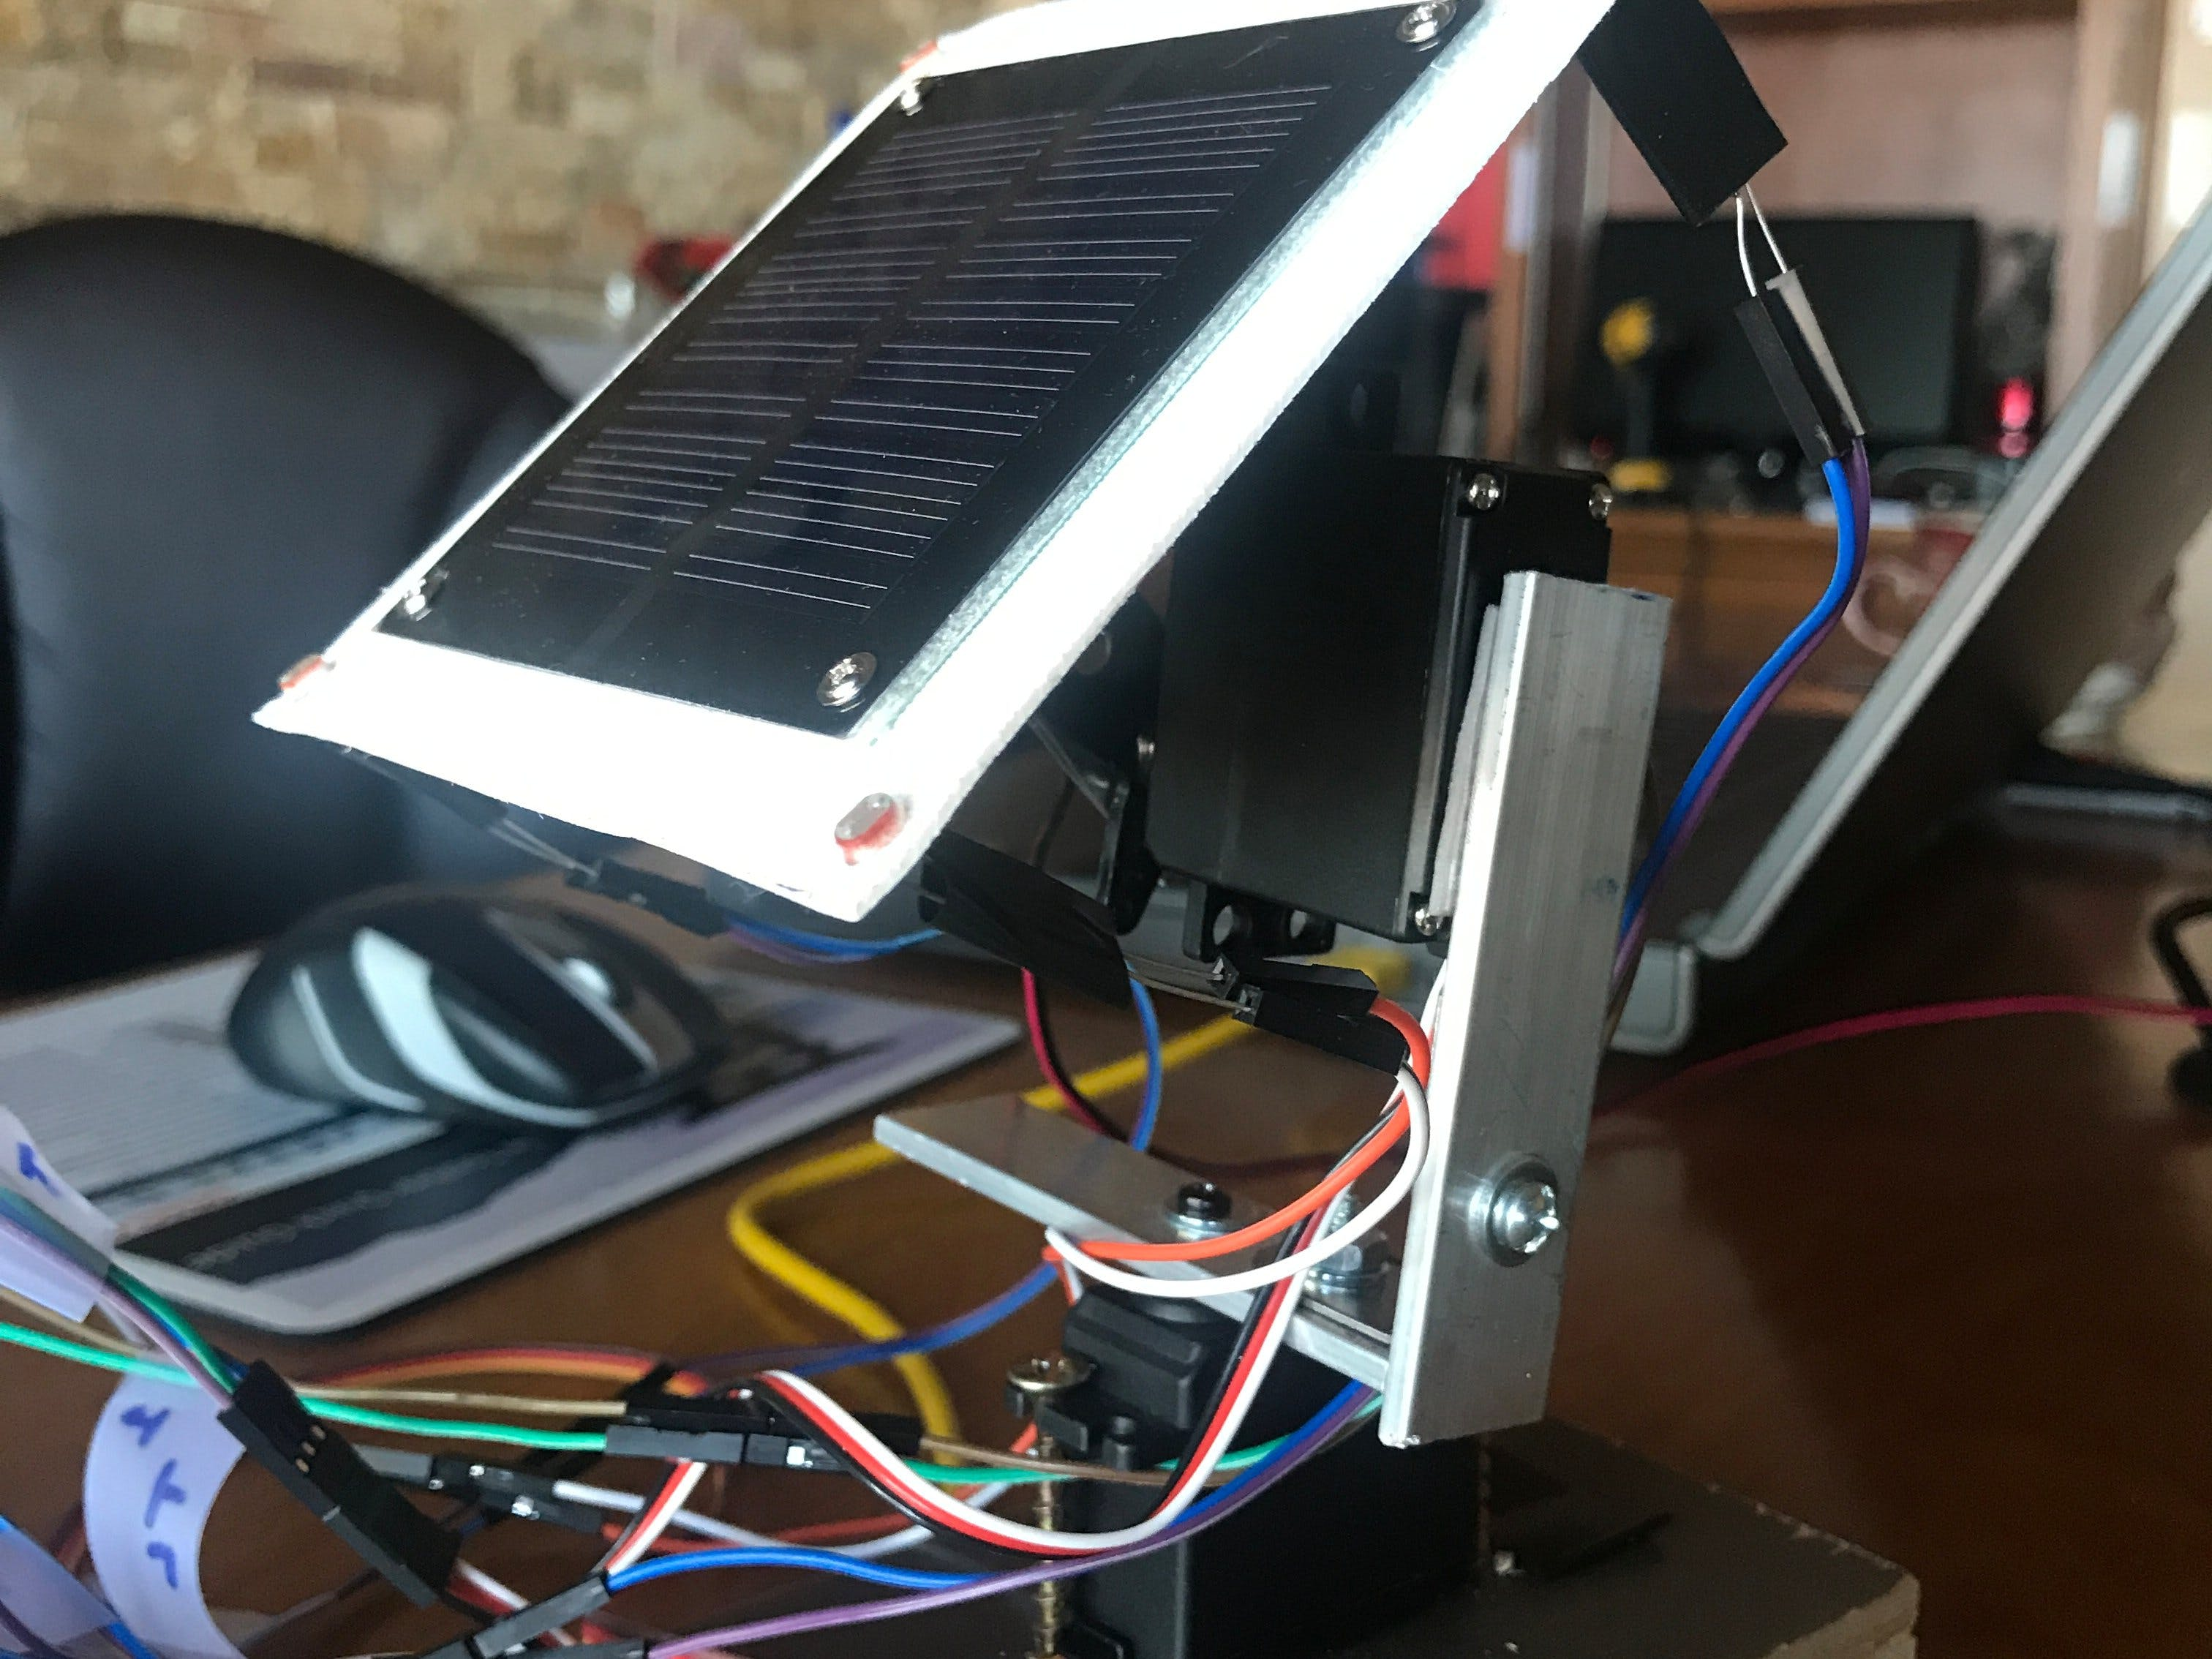 Servo-Controlled, Light-Tracking Solar Panel Platform